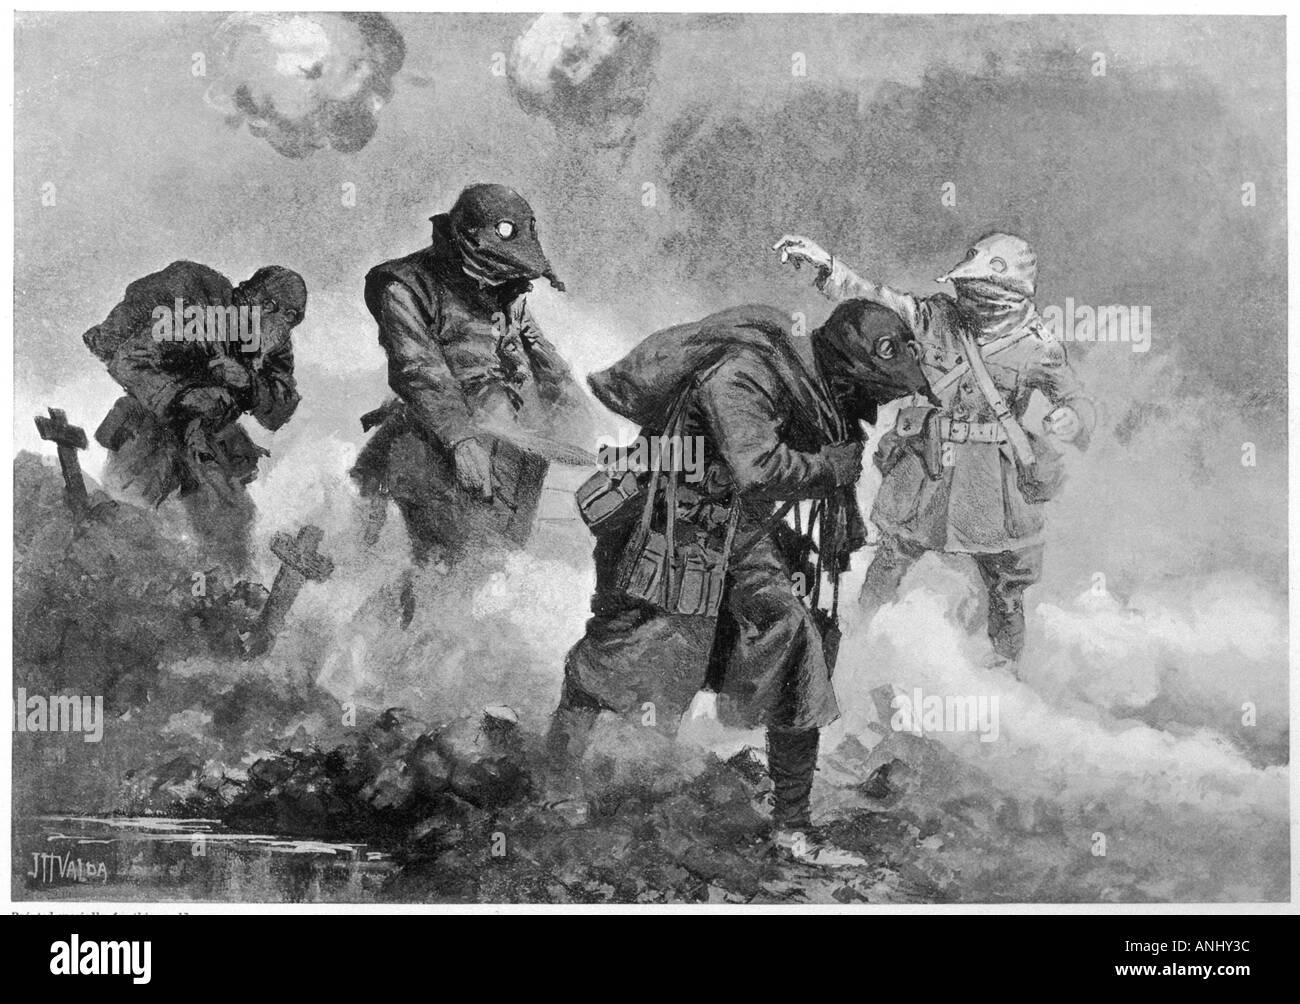 Ww1 1917 Gas Attack Stock Photos & Ww1 1917 Gas Attack ...